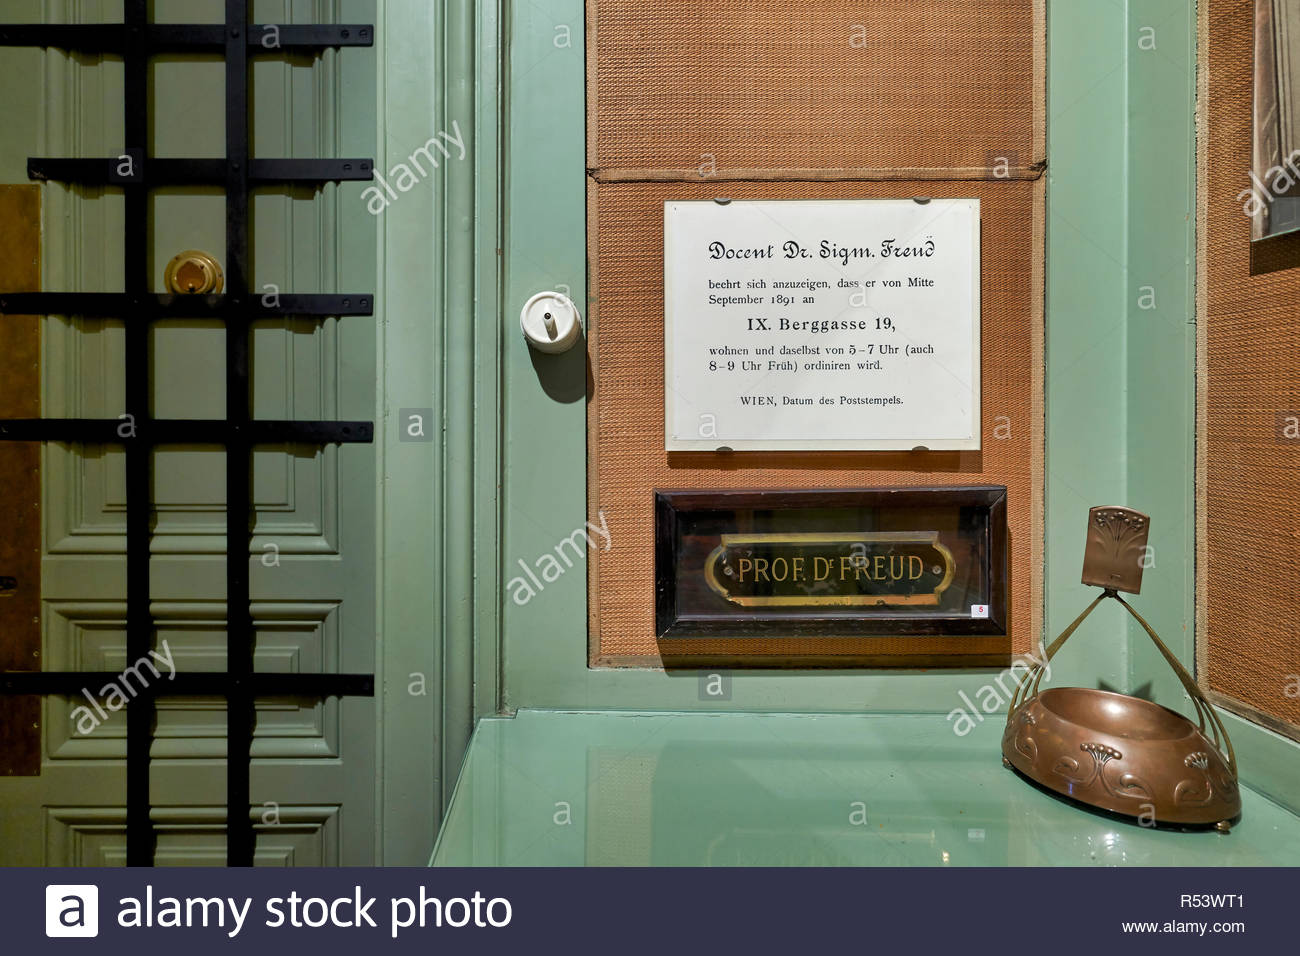 Professor Doctor Freud House Studio in Vienna Austria - Stock Image